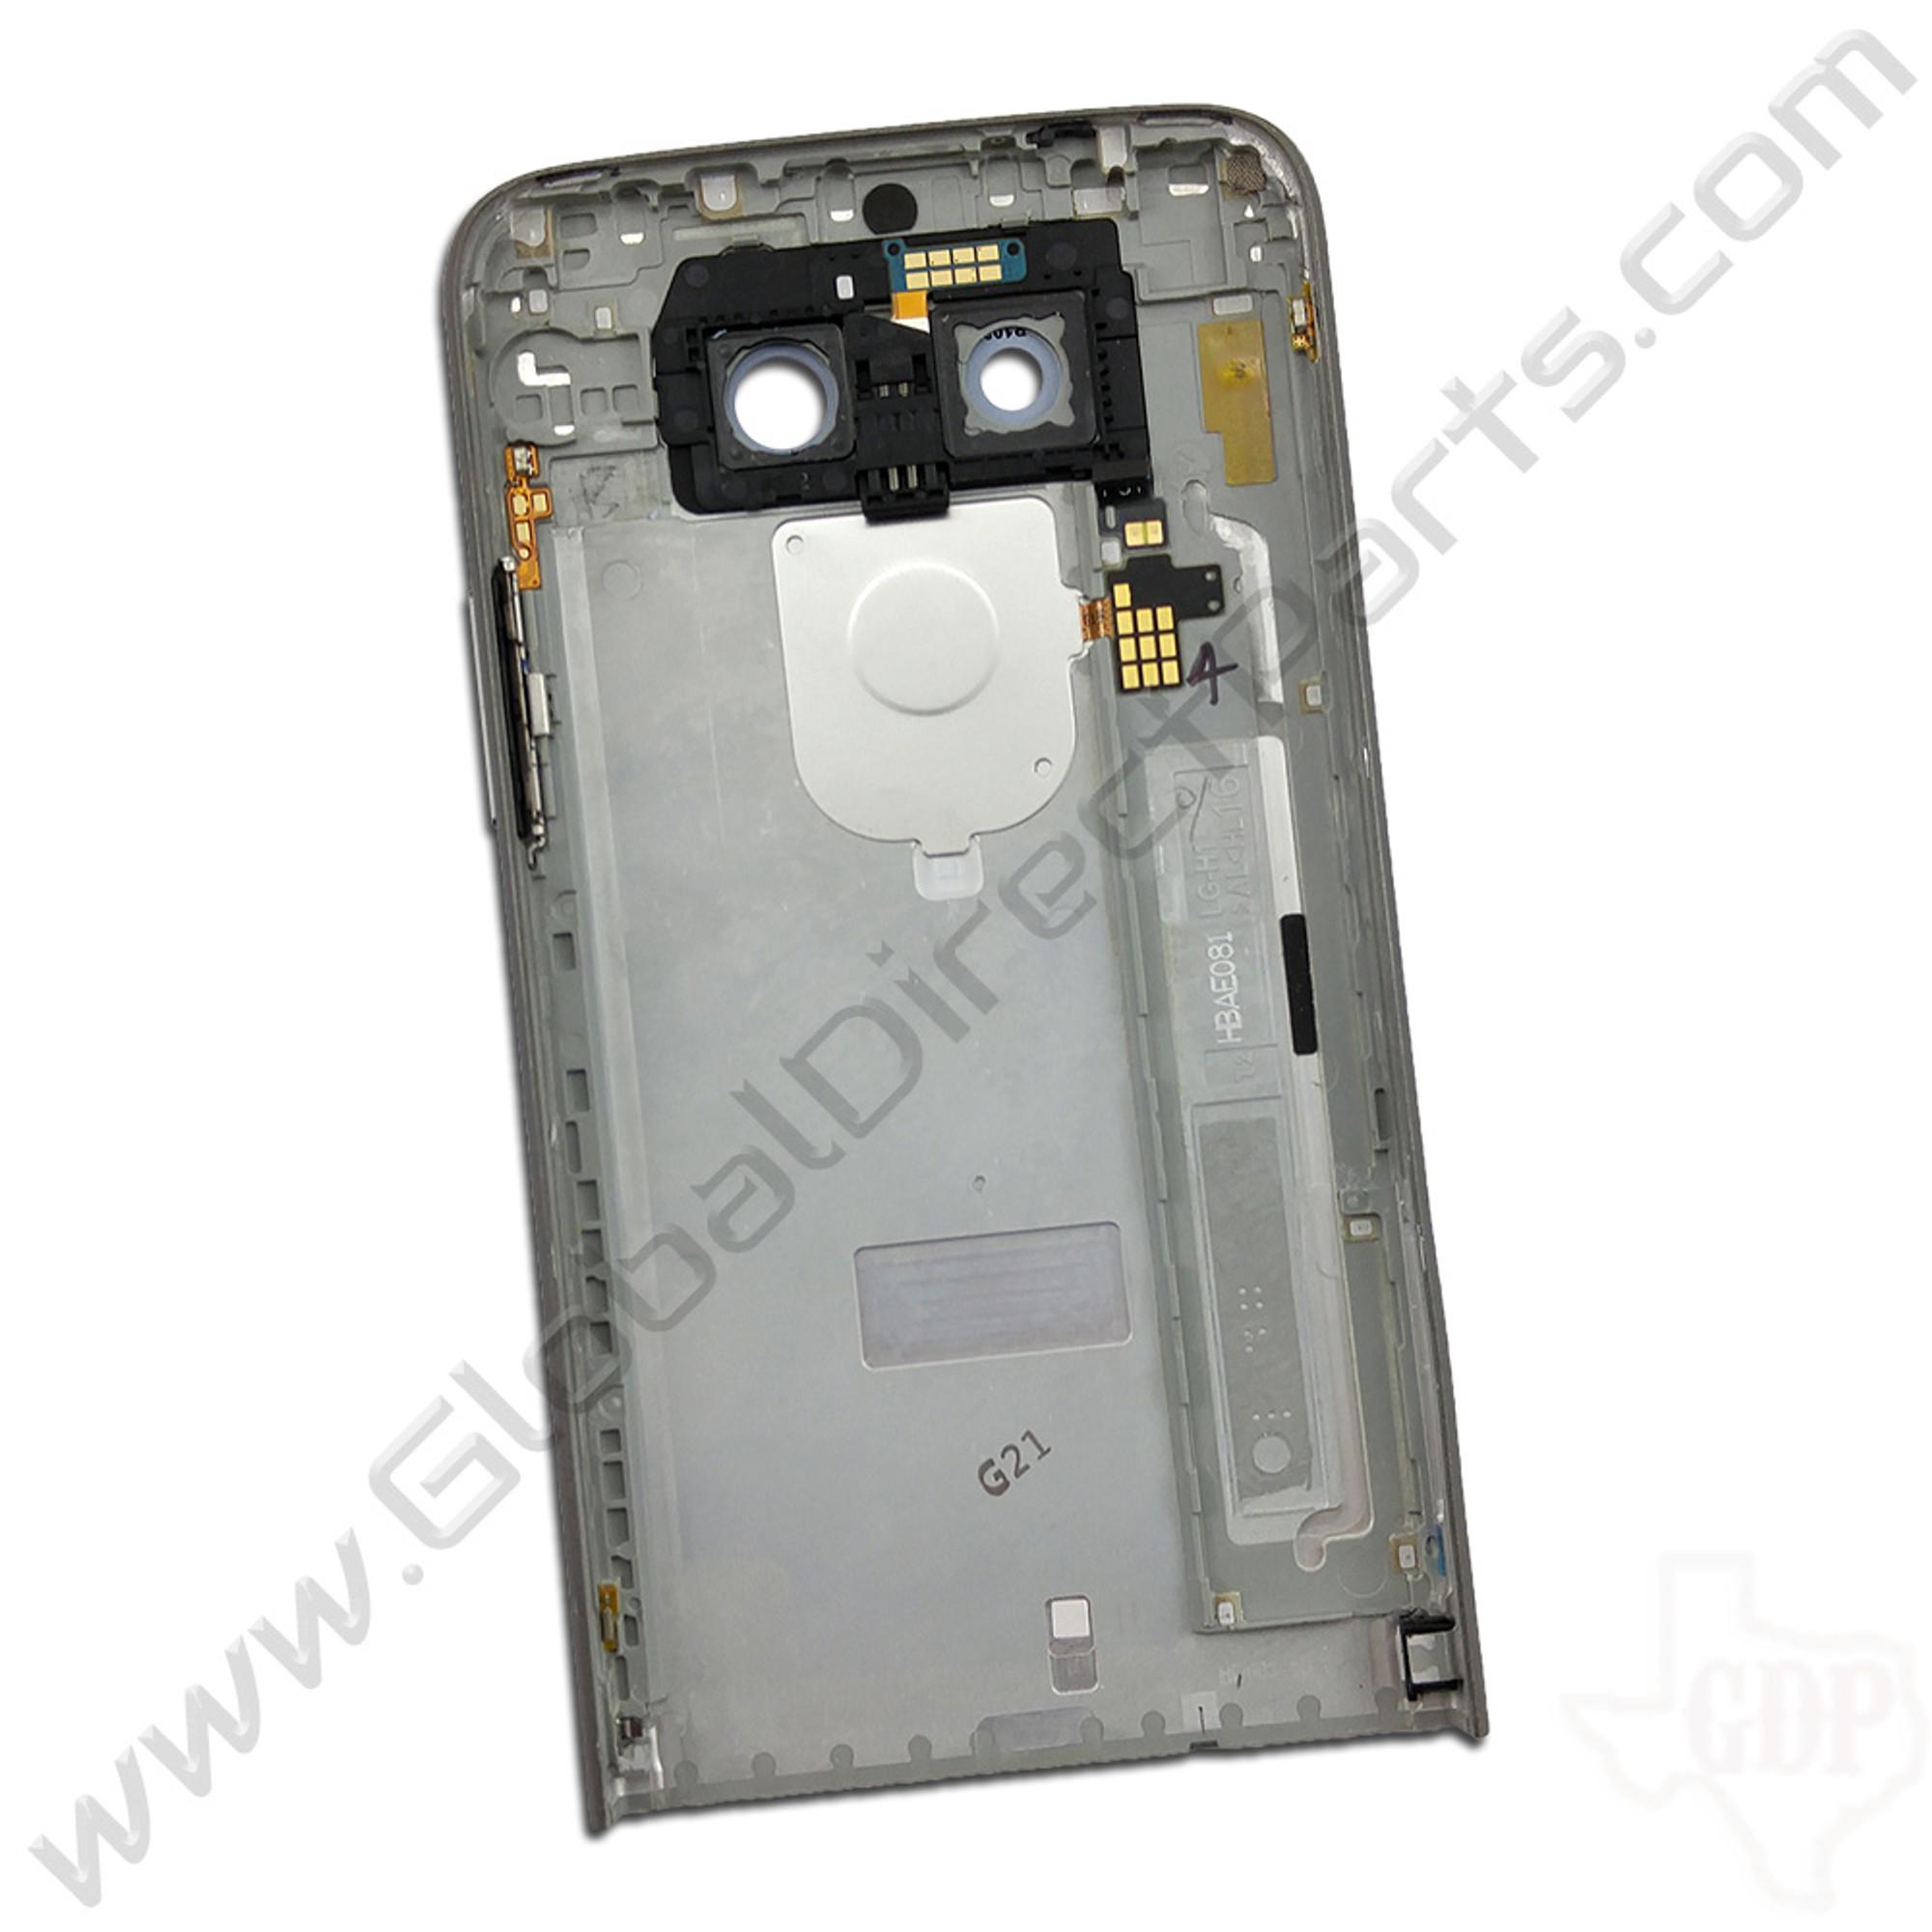 newest d4db9 5badd OEM LG G5 H820 Rear Housing - Gray